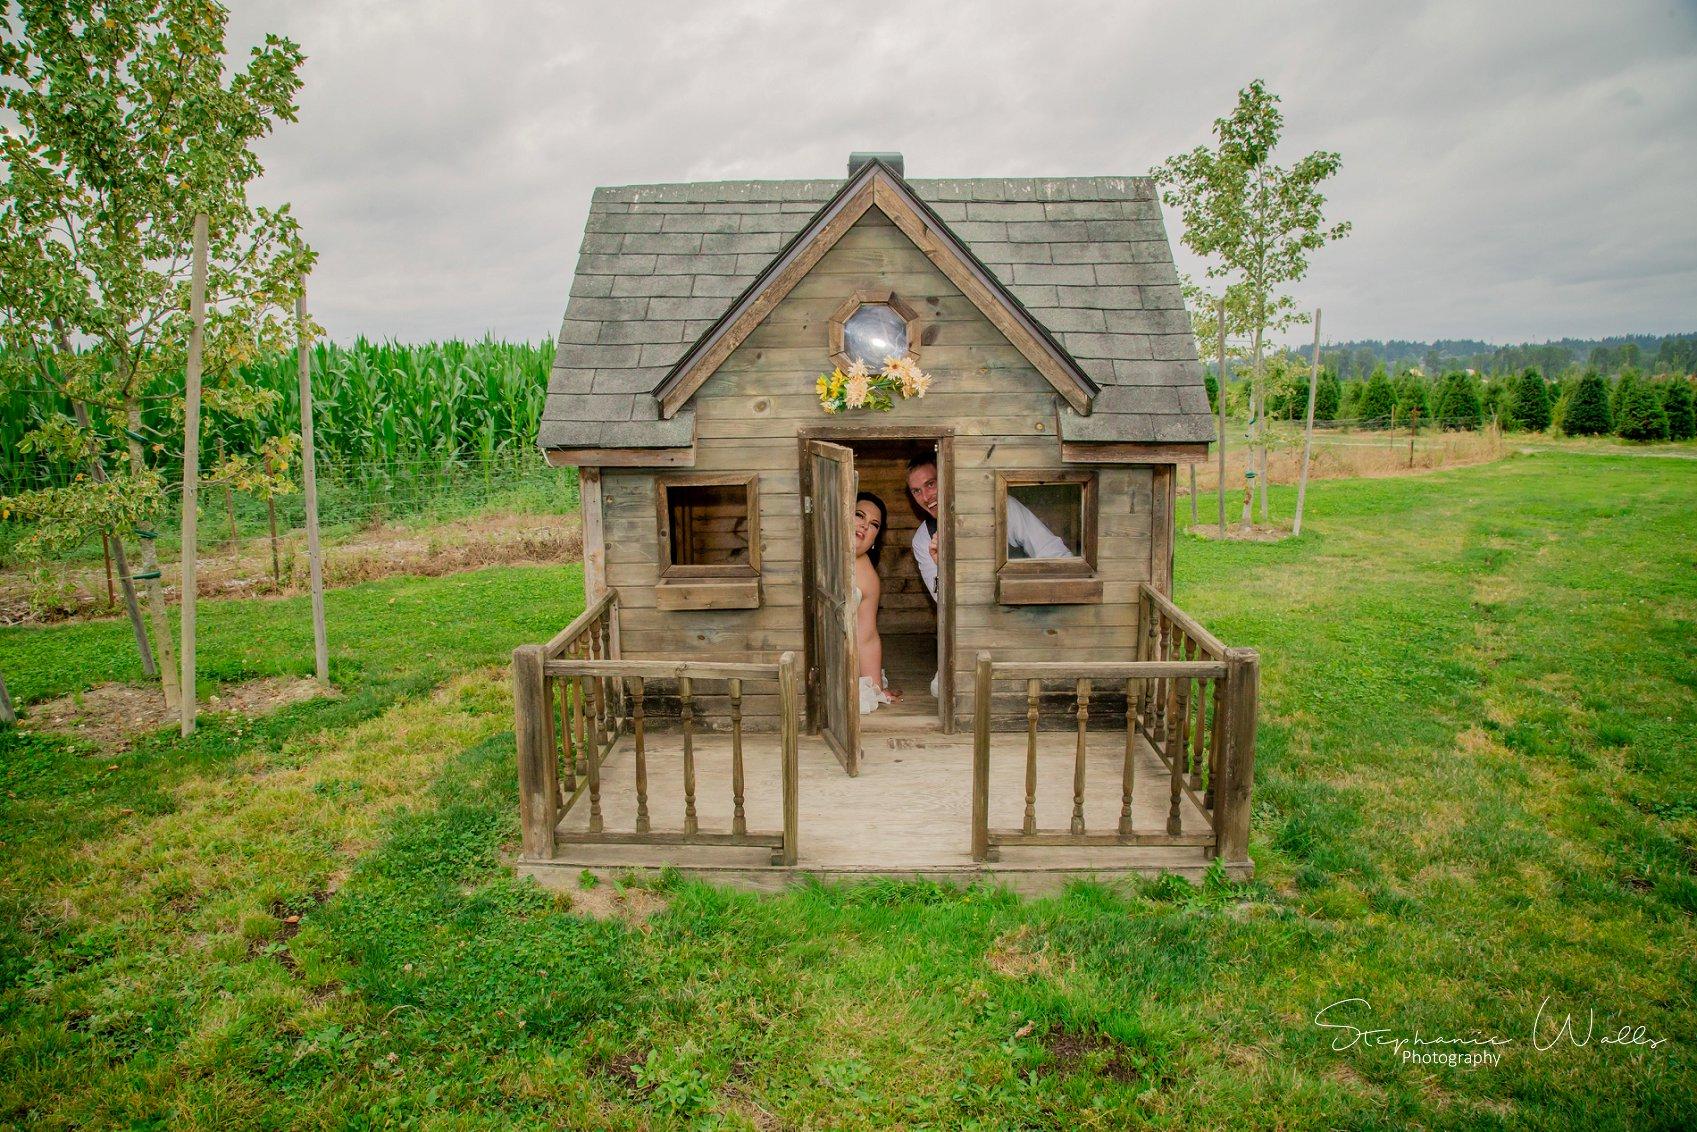 Kimble Wedding 084 Marlena & Allans | Snohomish Red Barn Events (Stocker Farms) | Snohomish, Wa Wedding Photographer